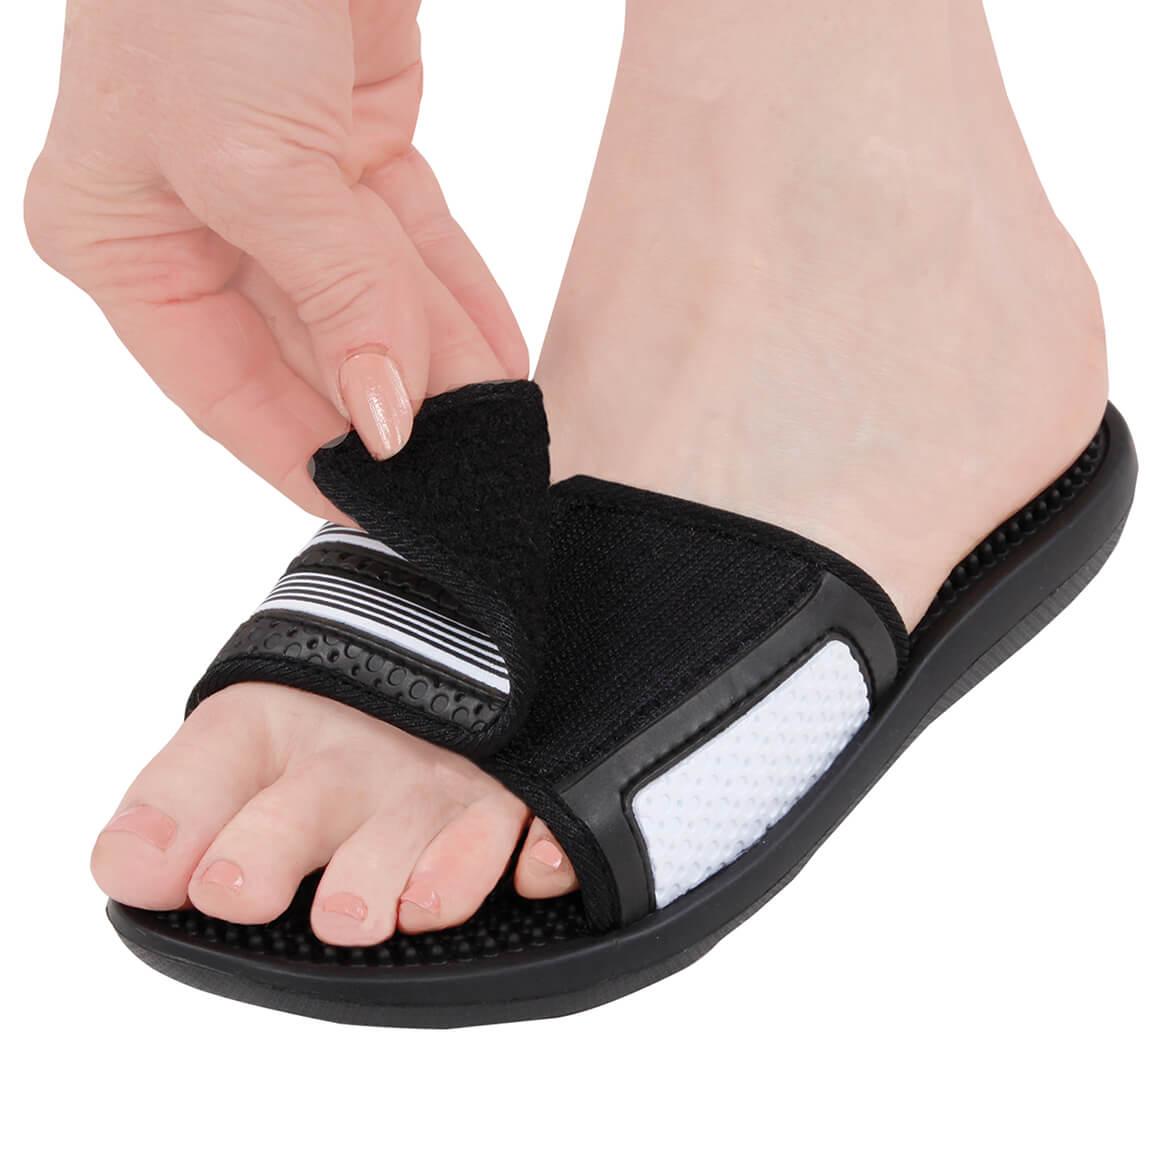 Energizing Acu Sandals-370021